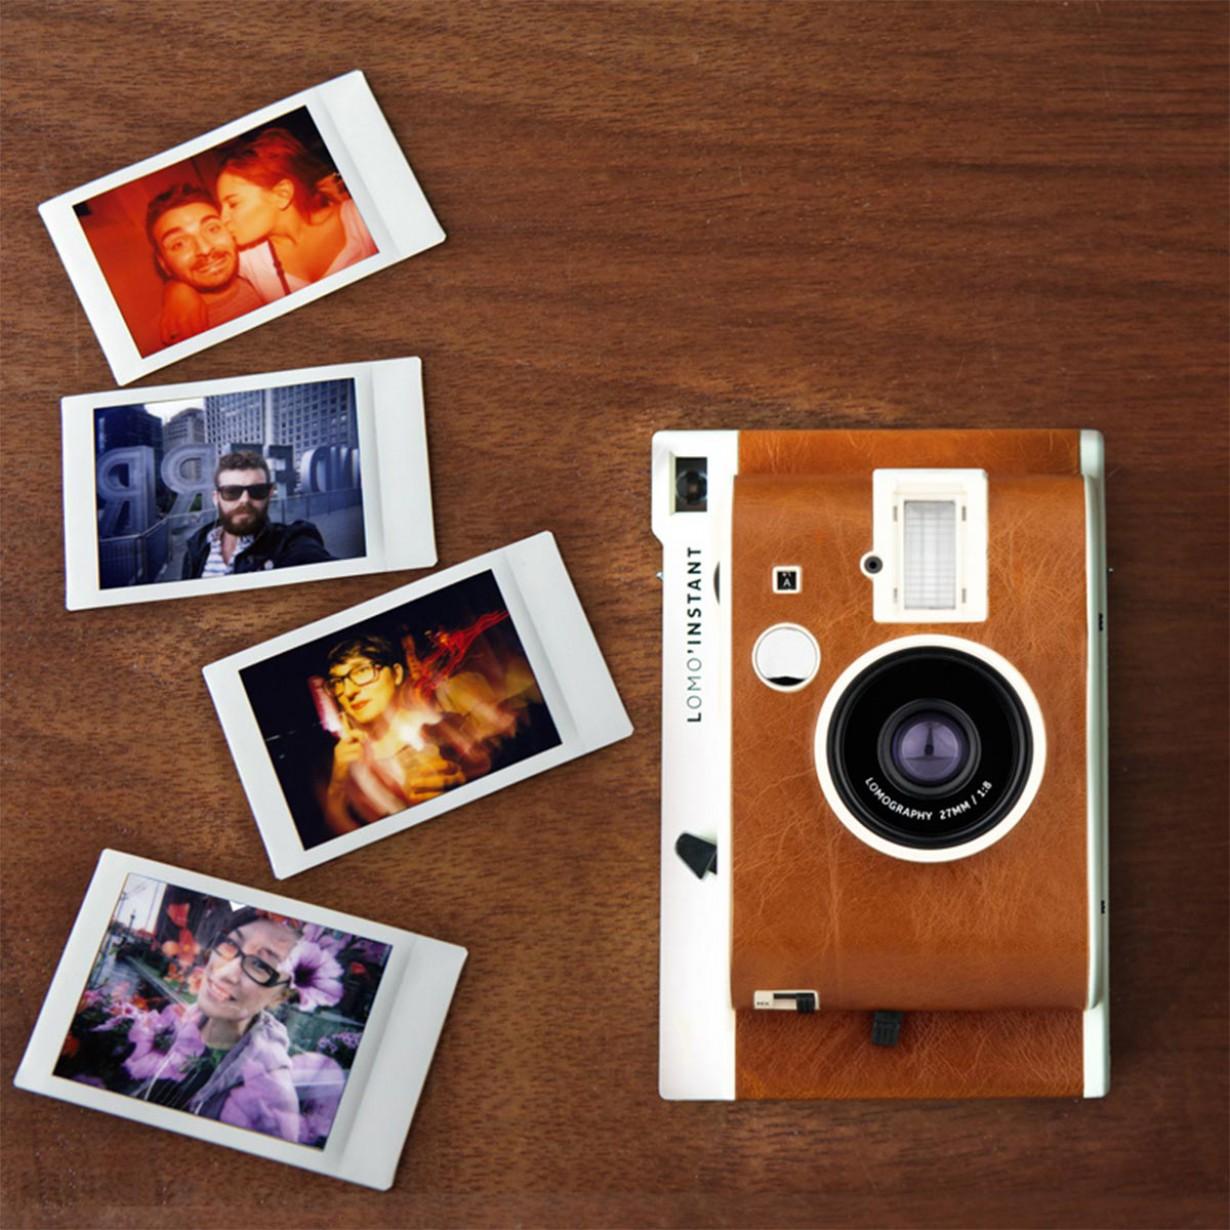 macchina-fotografica-istantanea-lomo-ce7